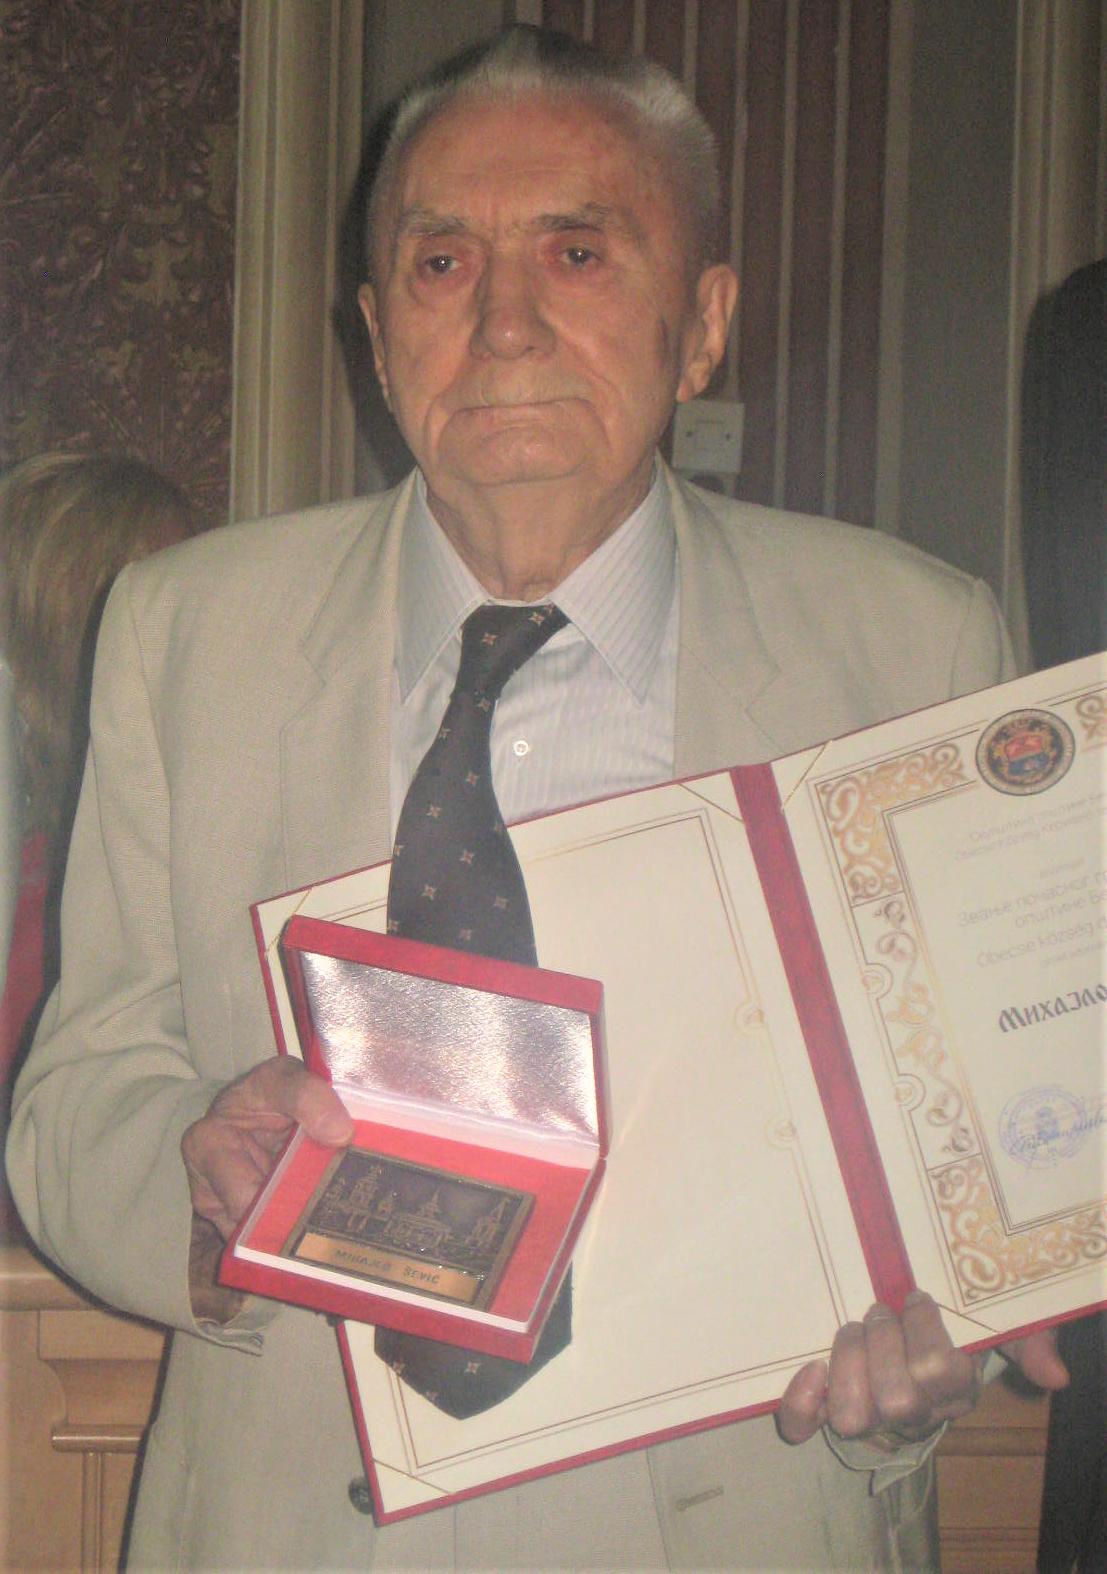 Arhiva: Počasni građanin opštine Bečej Mihajlo Šević sa poveljom